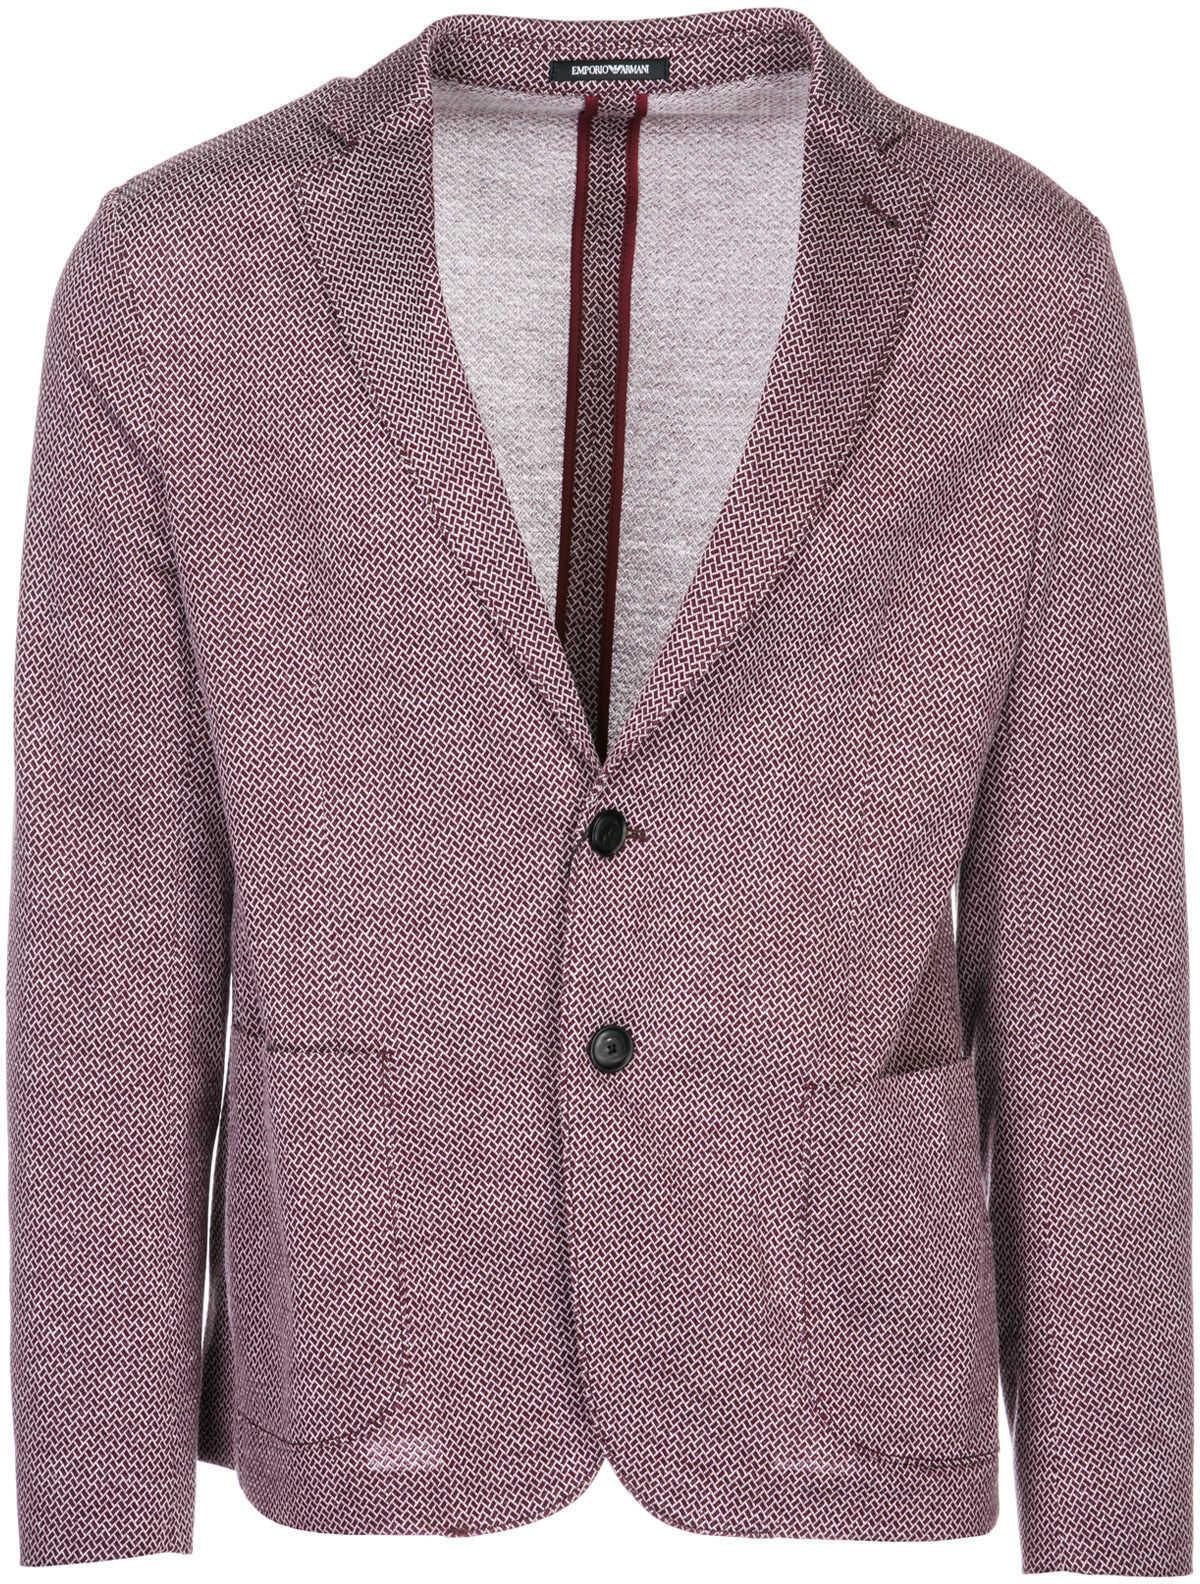 Emporio Armani Jacket Blazer Red imagine